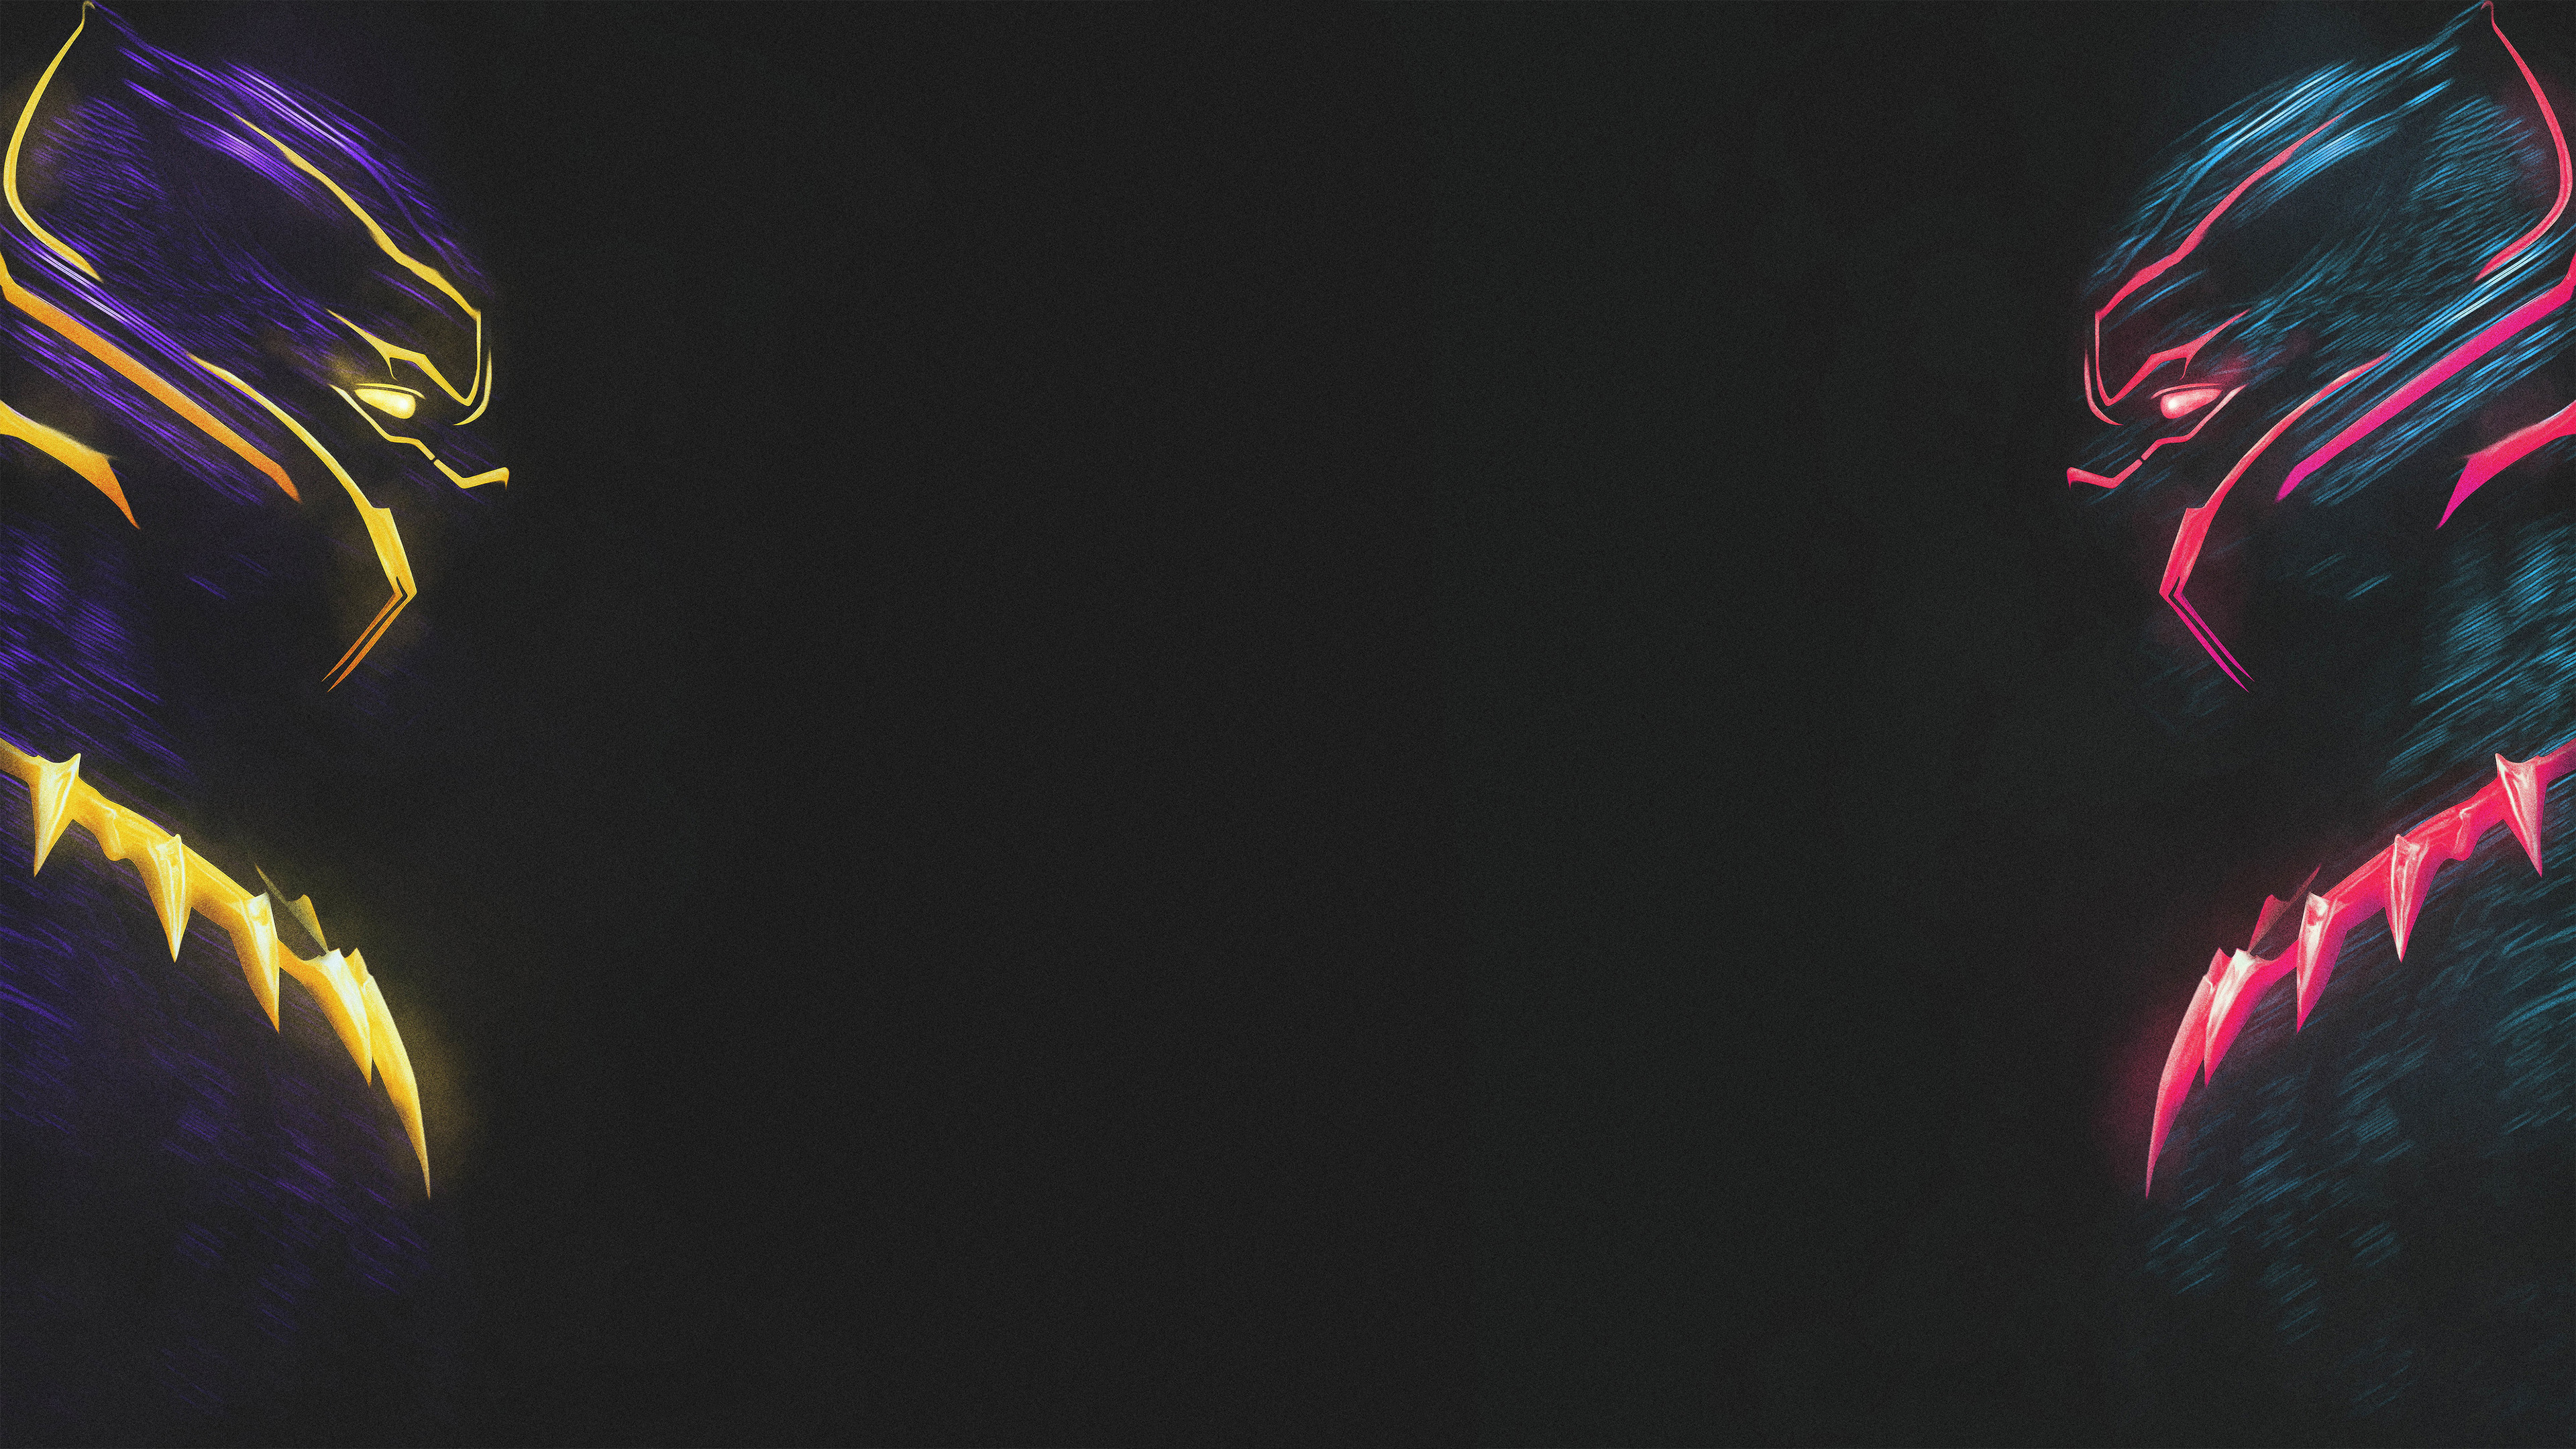 1920x1080 Erik Killmonger Black Panther Art 4k Laptop Full ...